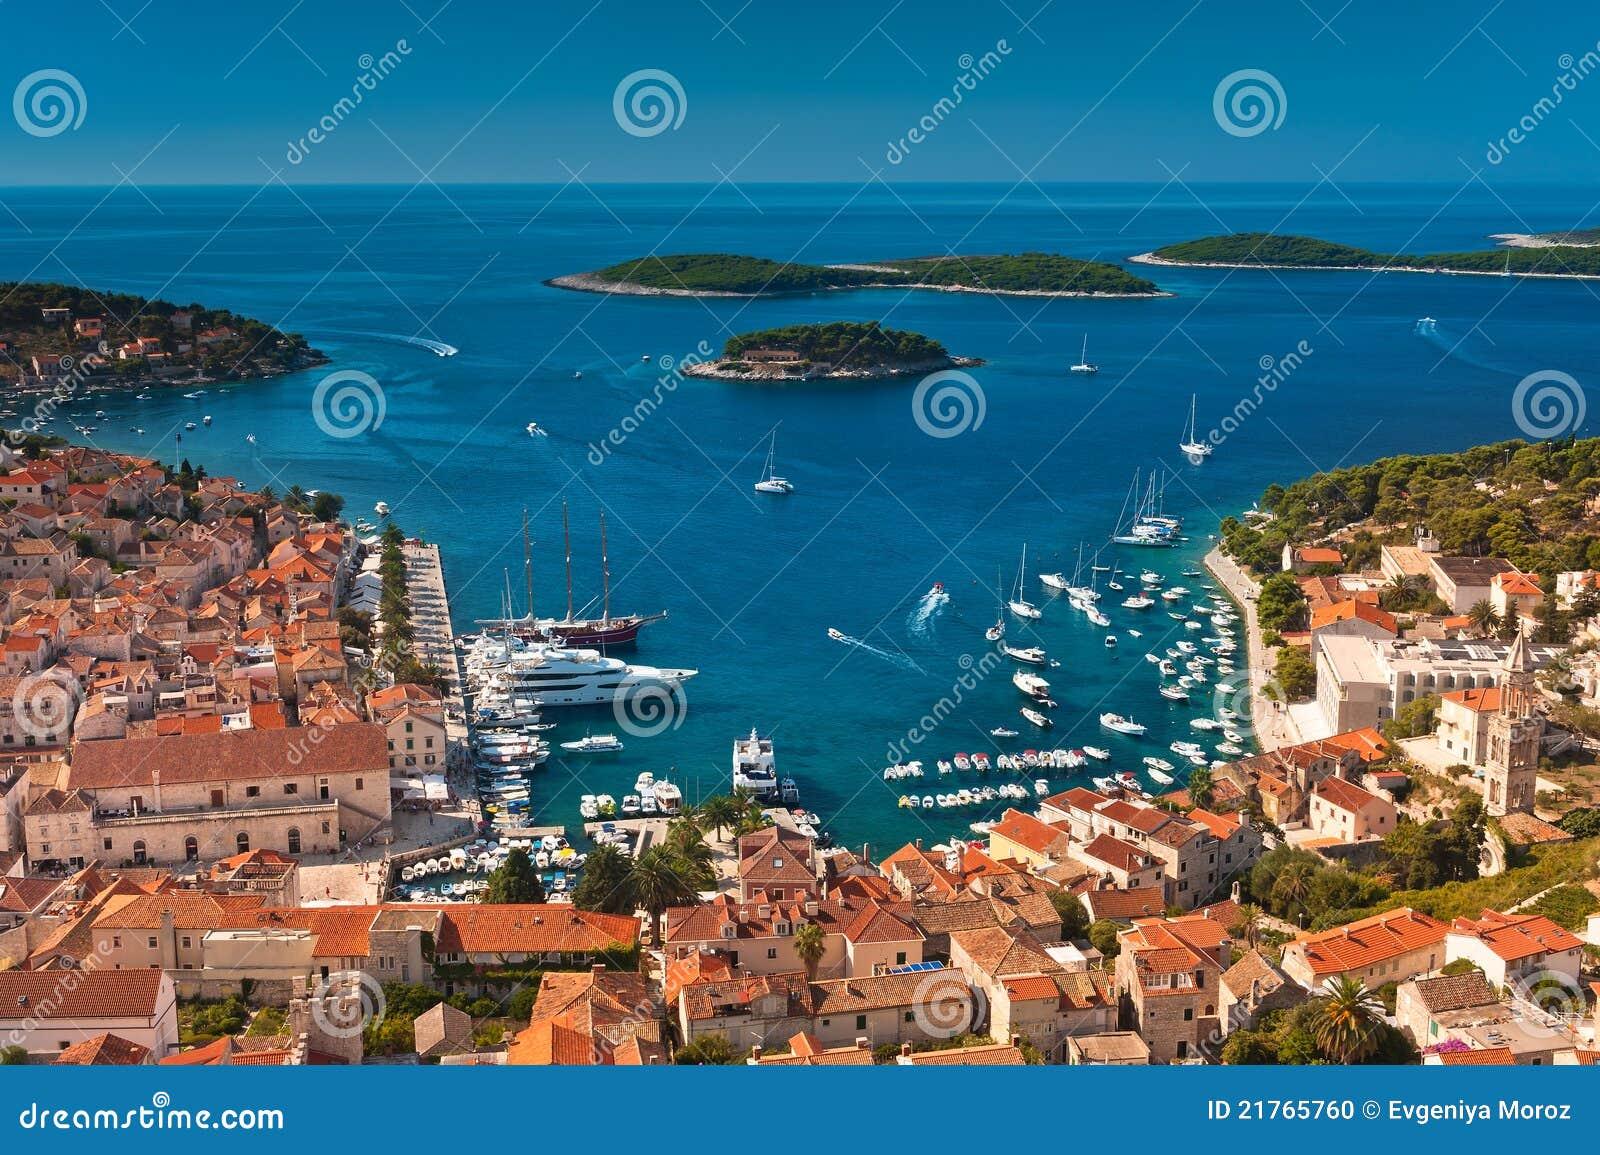 Harbor of old Adriatic island town Hvar